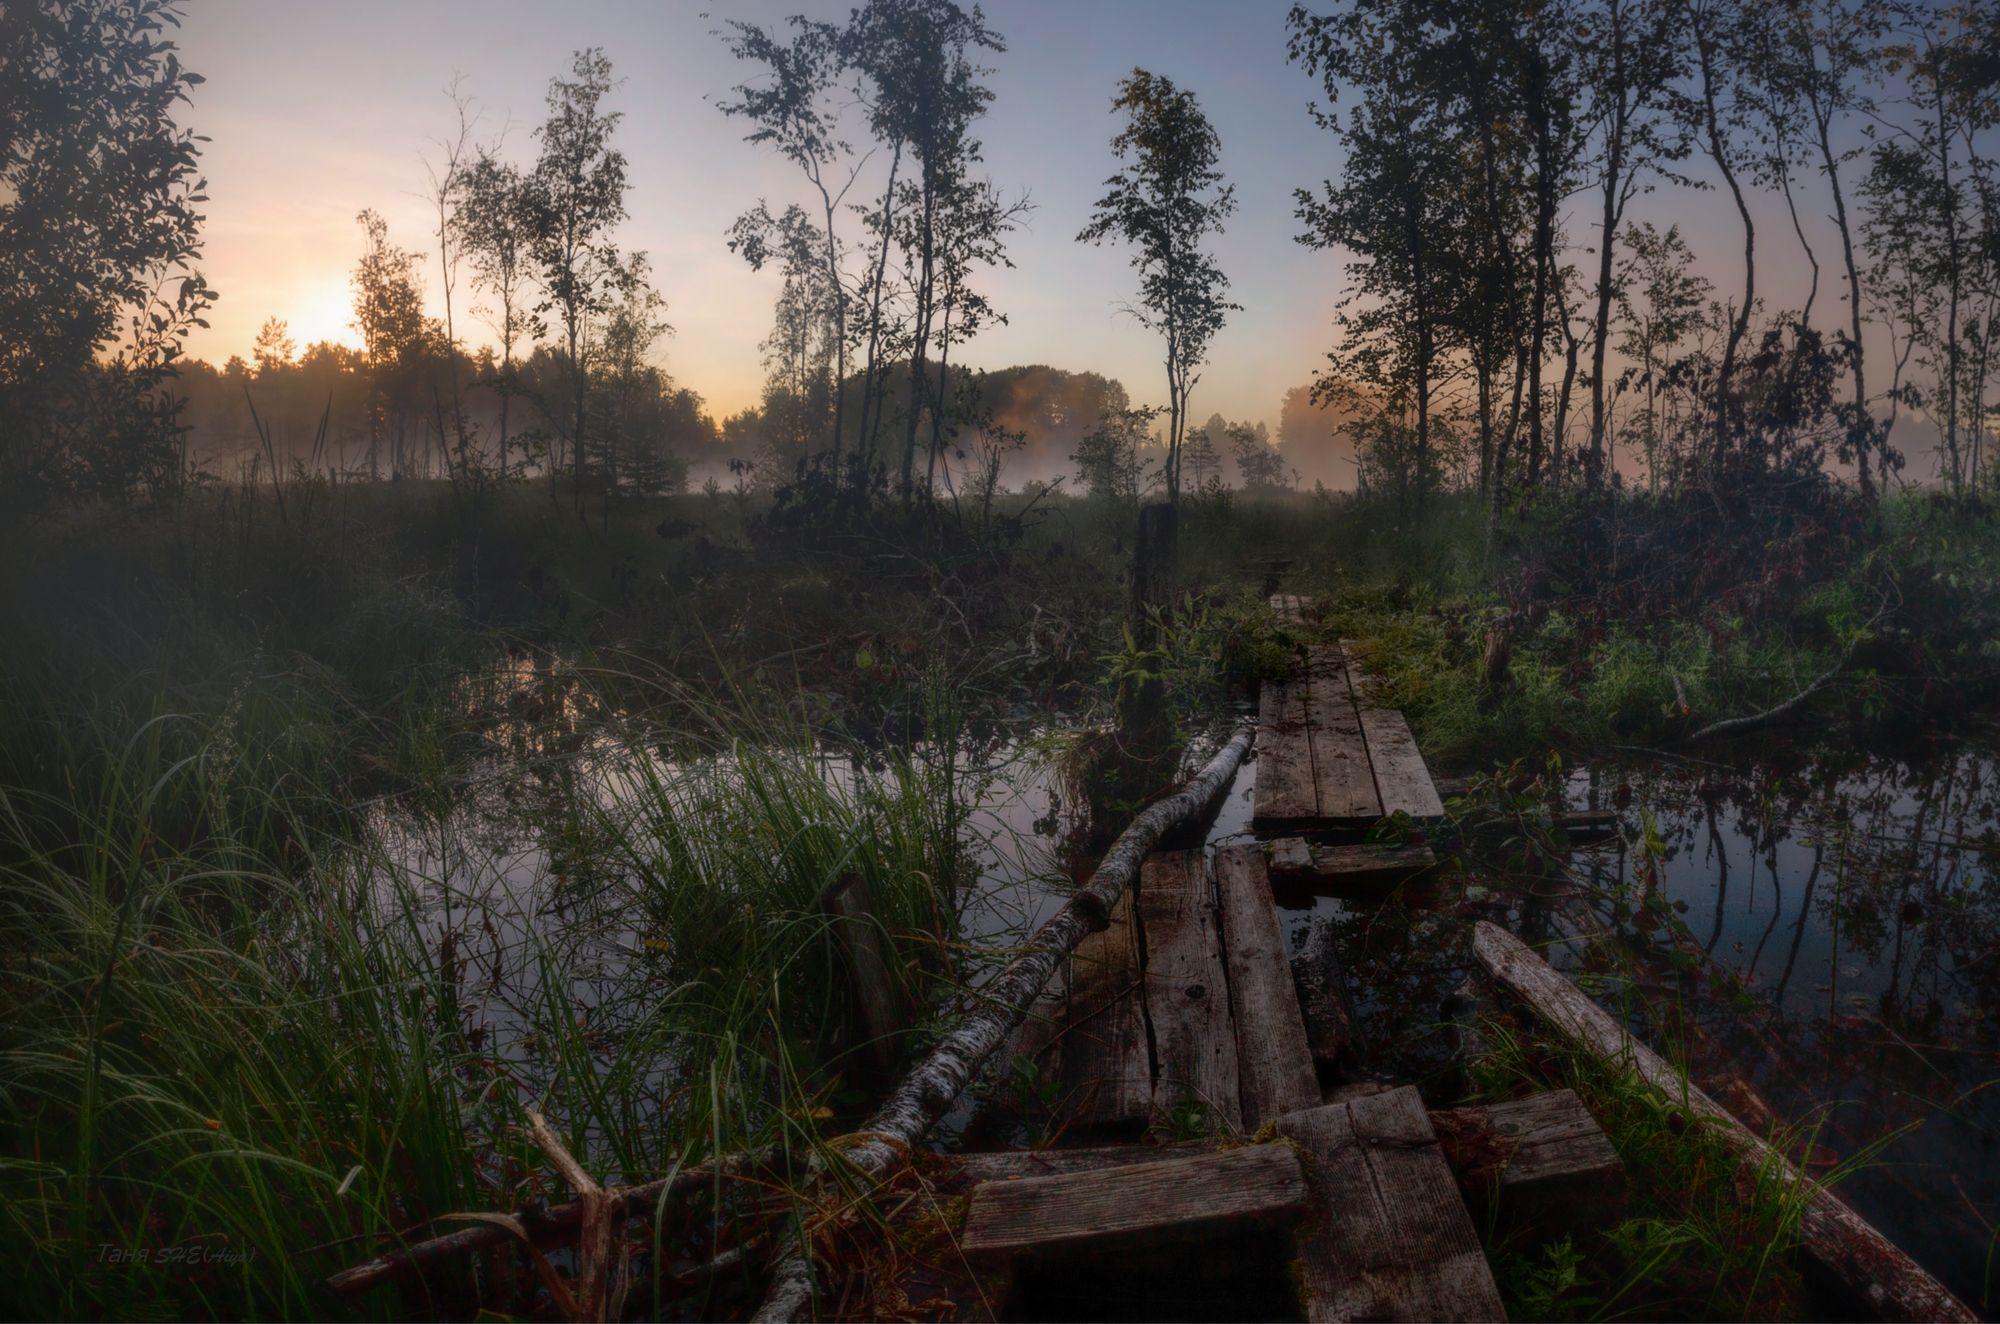 природа, пейзаж, рассвет, туман, луга, SHE (Aiya) Таня